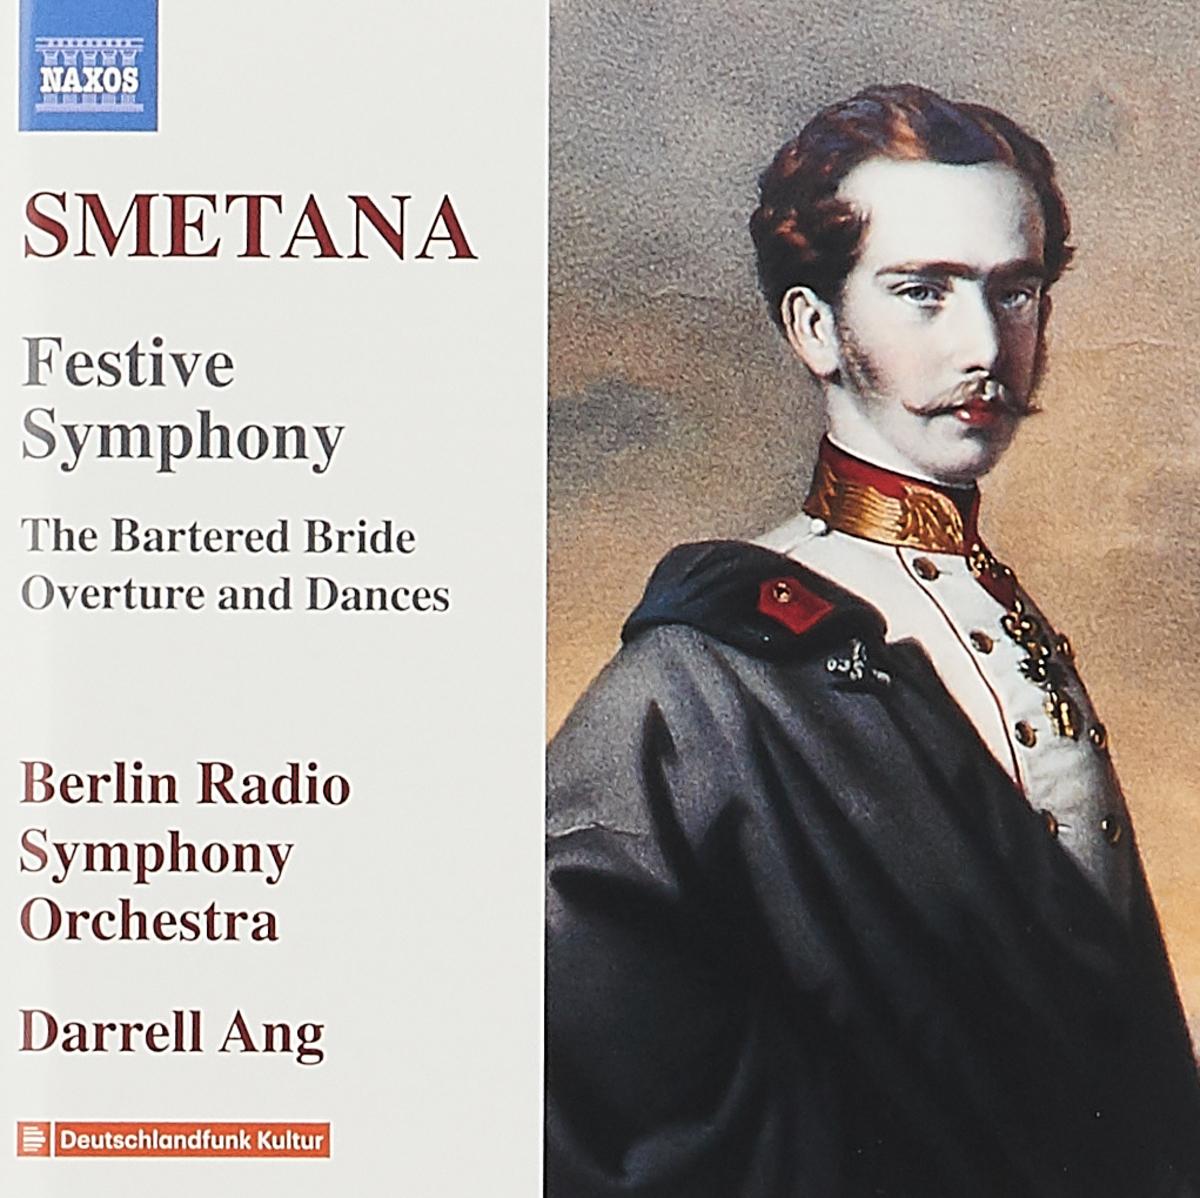 Бедржих Сметана Smetana. Festive Symphony In E Major, Op. 6. The Bartered Bride: Overture And Dances ann major the amalfi bride